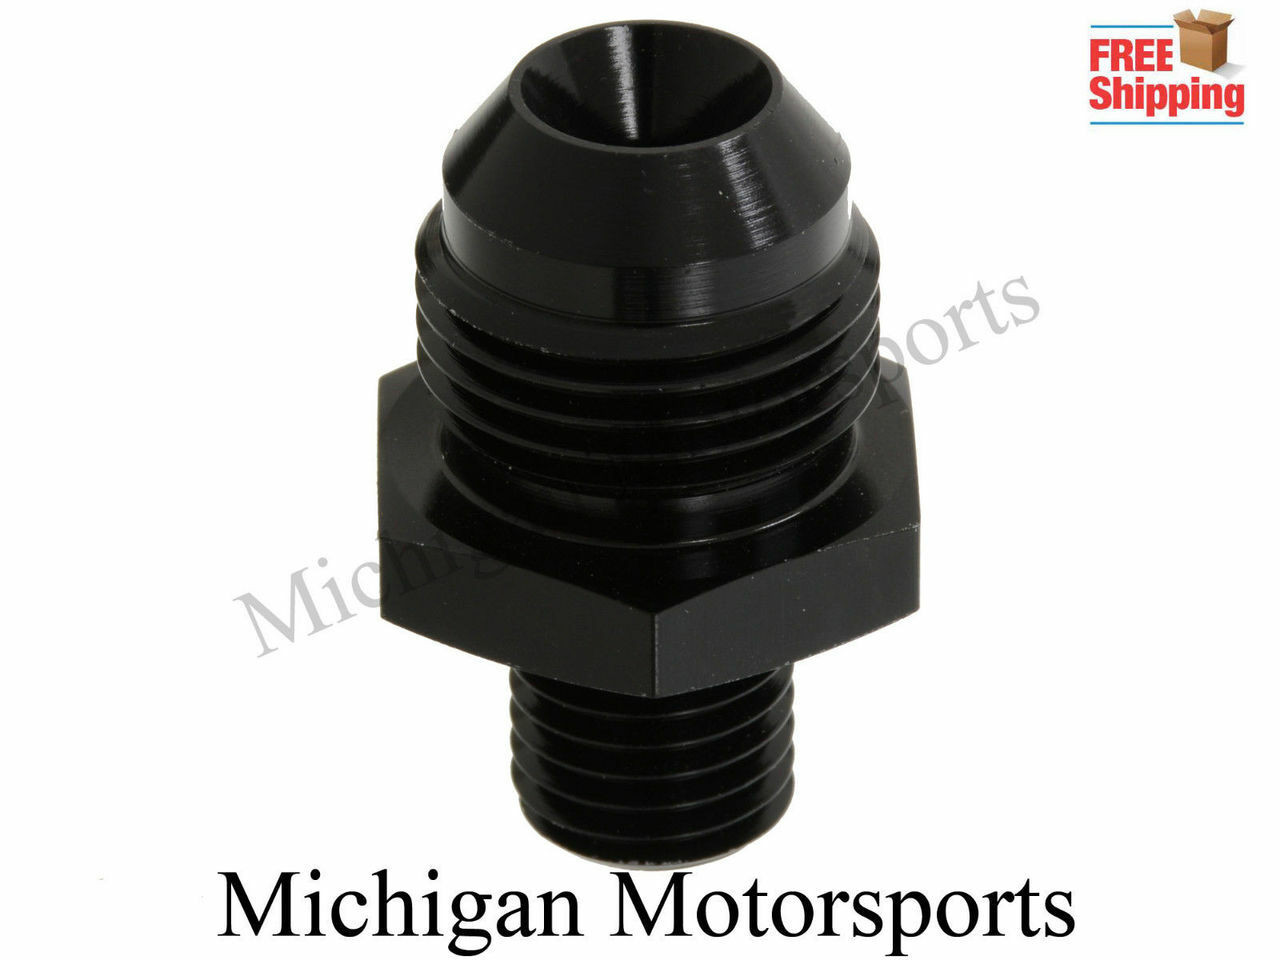 michgan motorsports 044 fuel pump an fittings (8an in \u0026 out) fitsmichgan motorsports 044 fuel pump an fittings (8an in \u0026 out) fits bosch fuel pumps